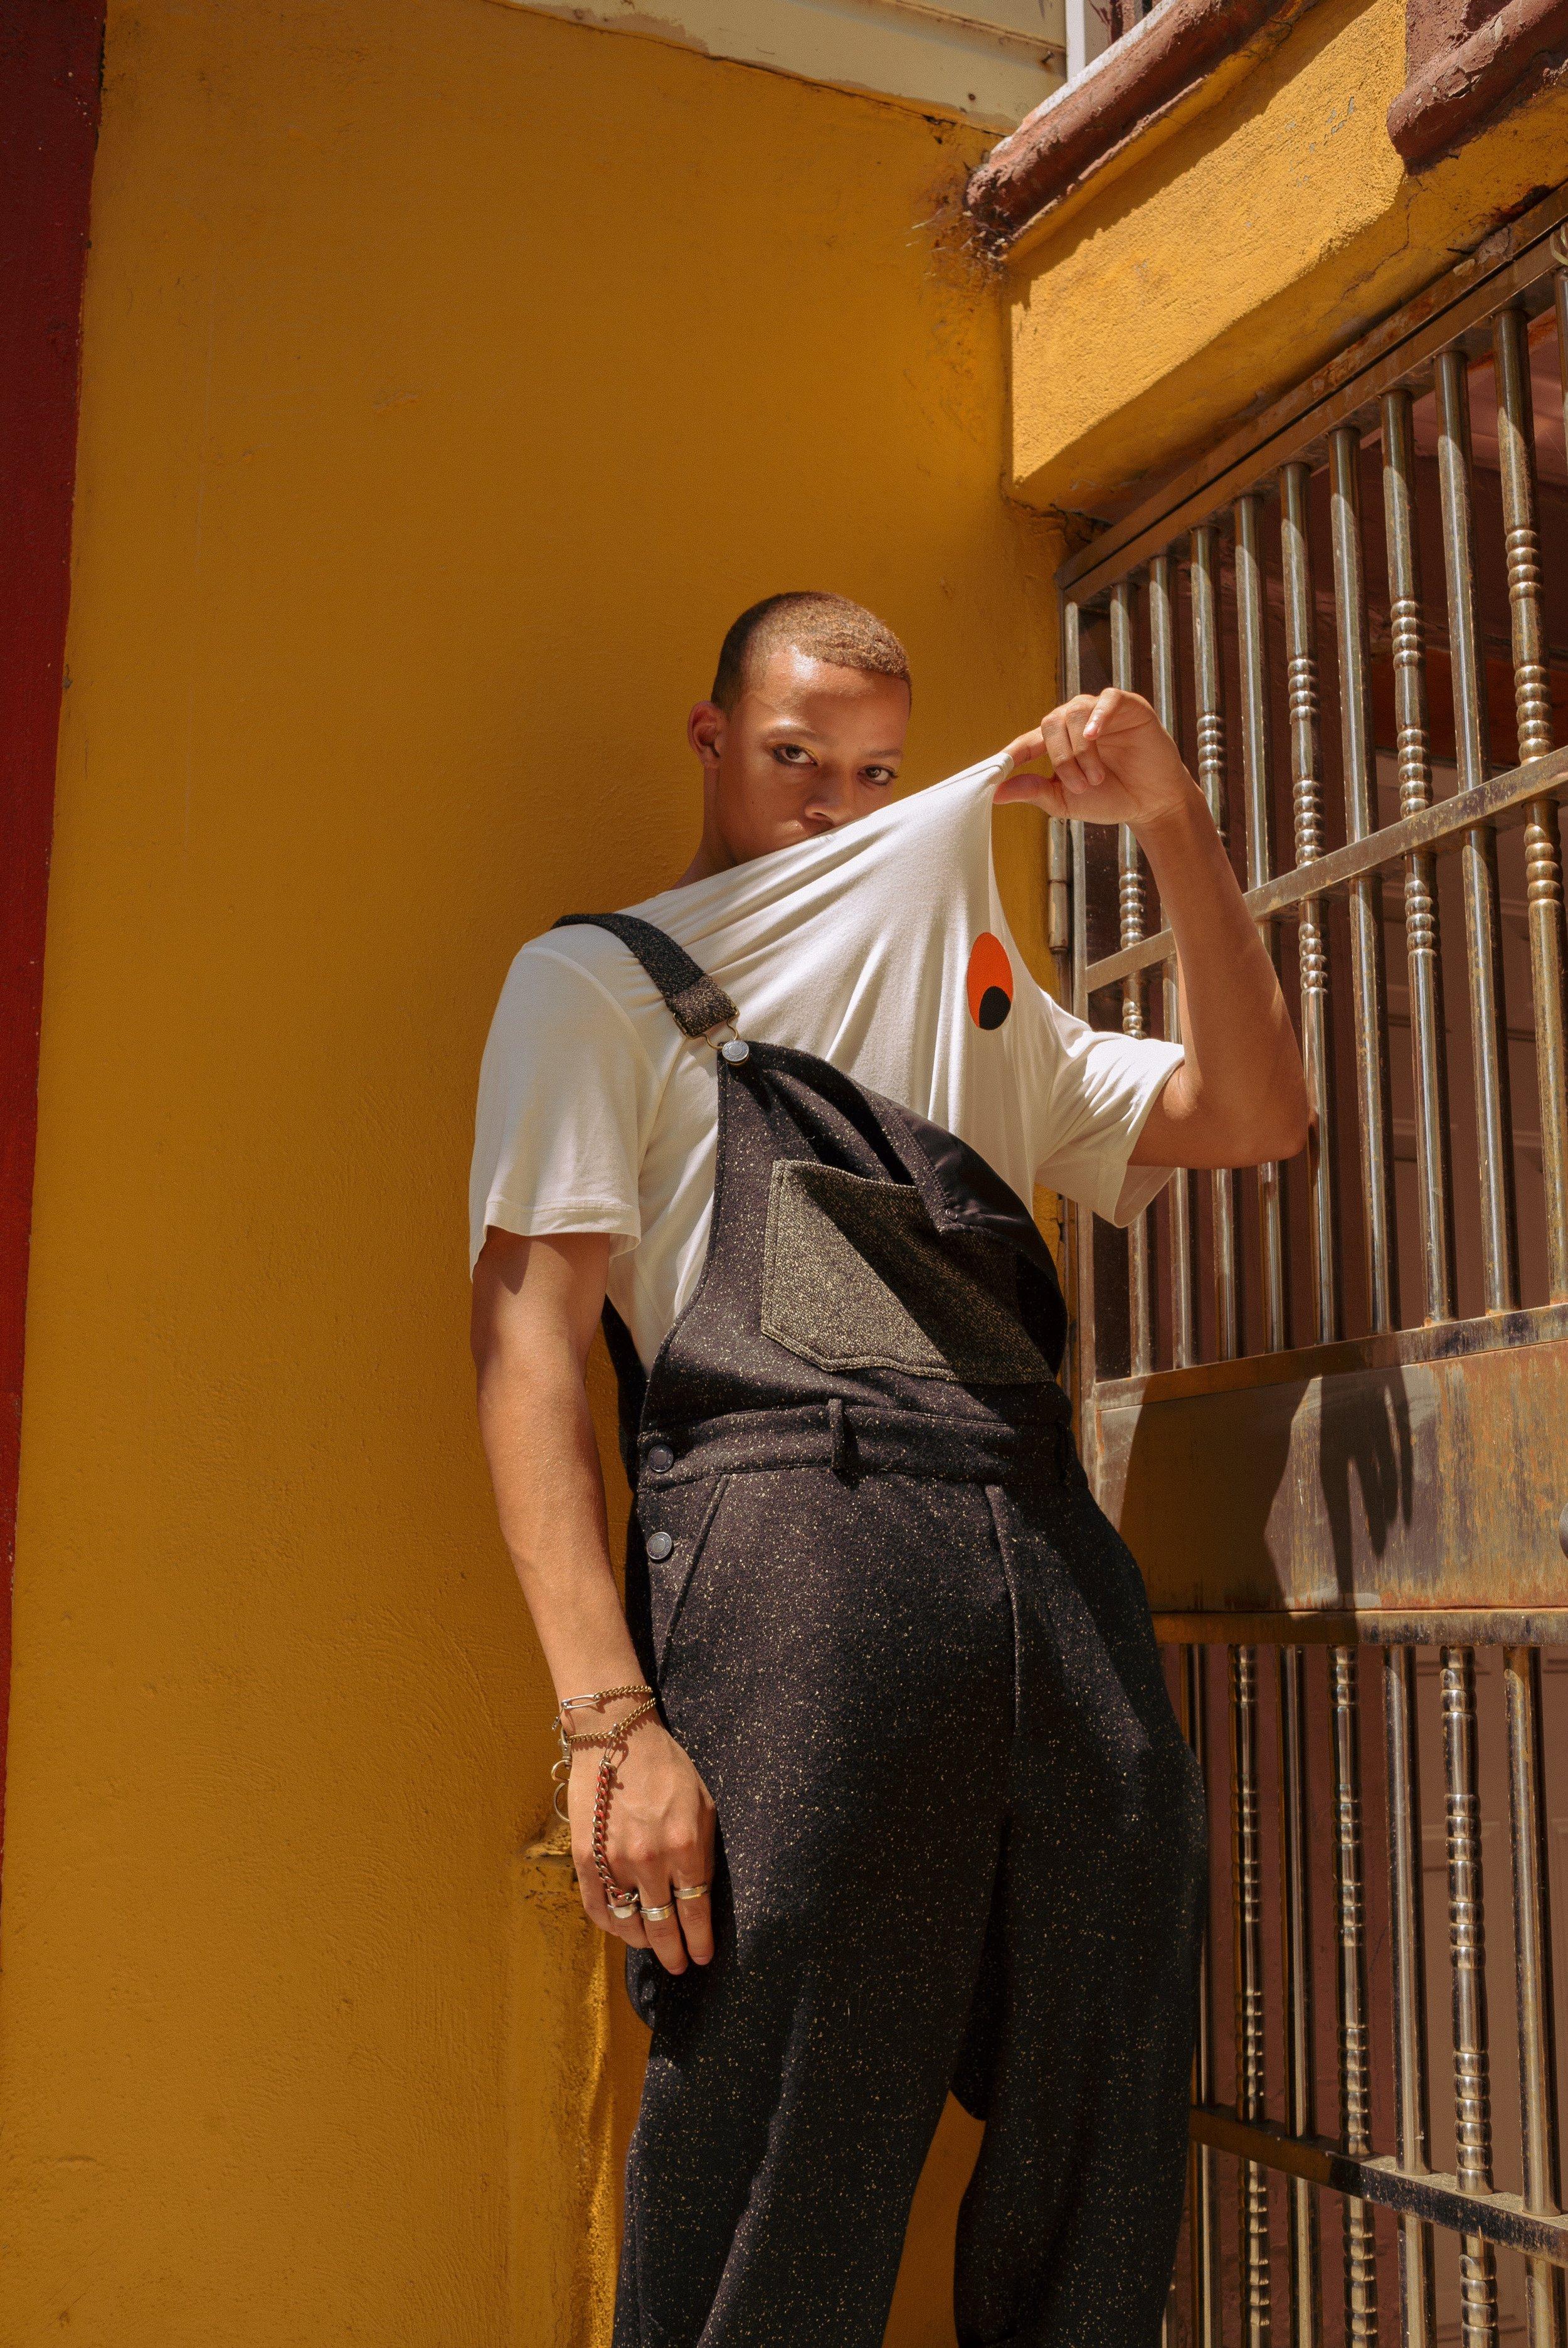 full look by Rochambeau  Photographer: DIego Palomino, MUA: Nana Hiramatsu, Model: Joel Kelly